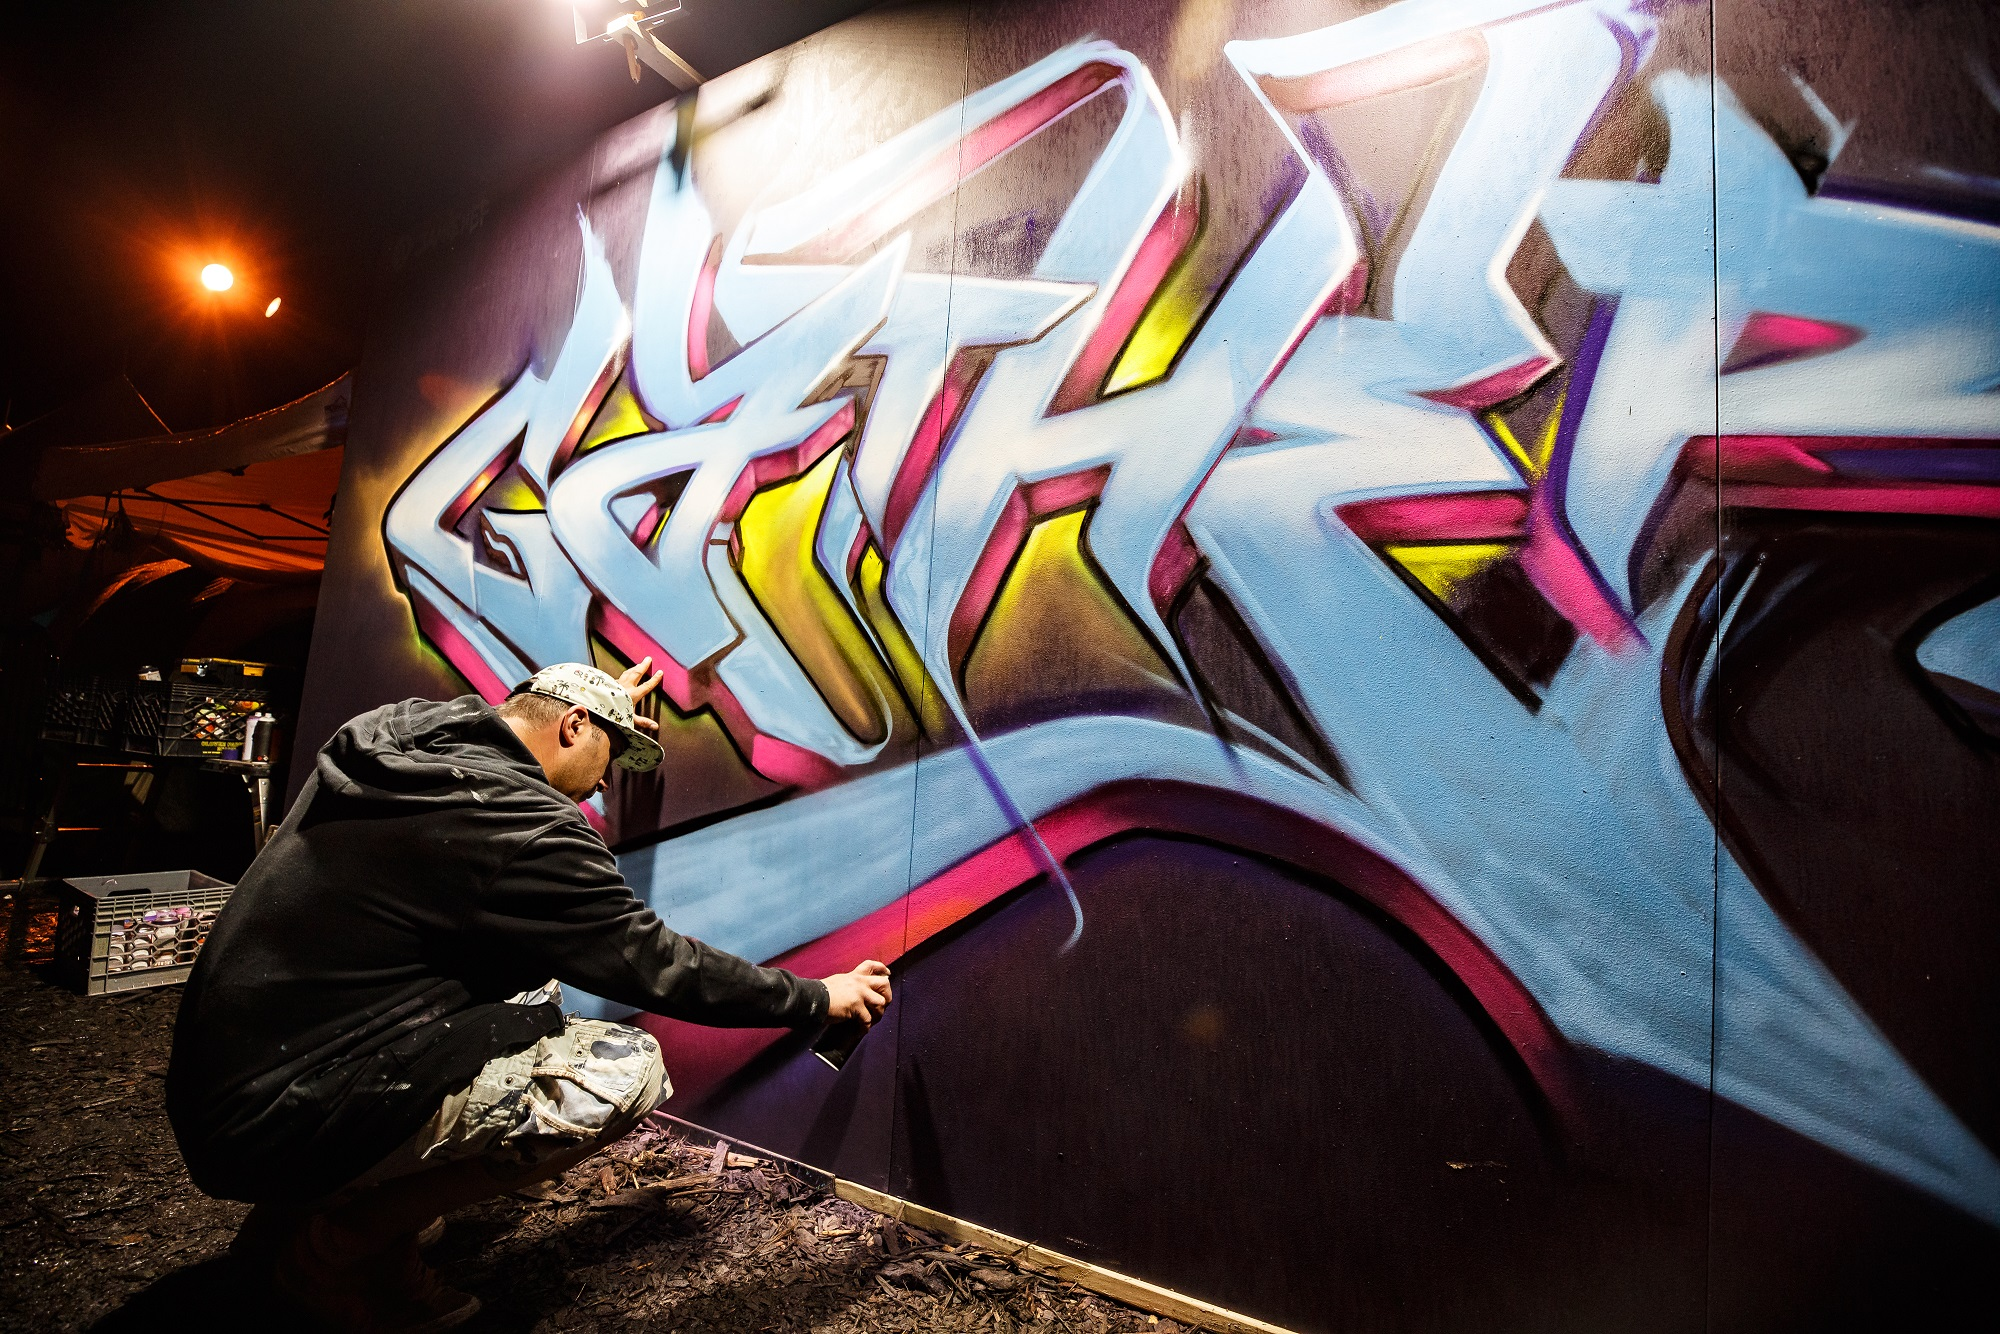 05-25-19_GatherOutdoors_By@ChrisLavado-42.jpg